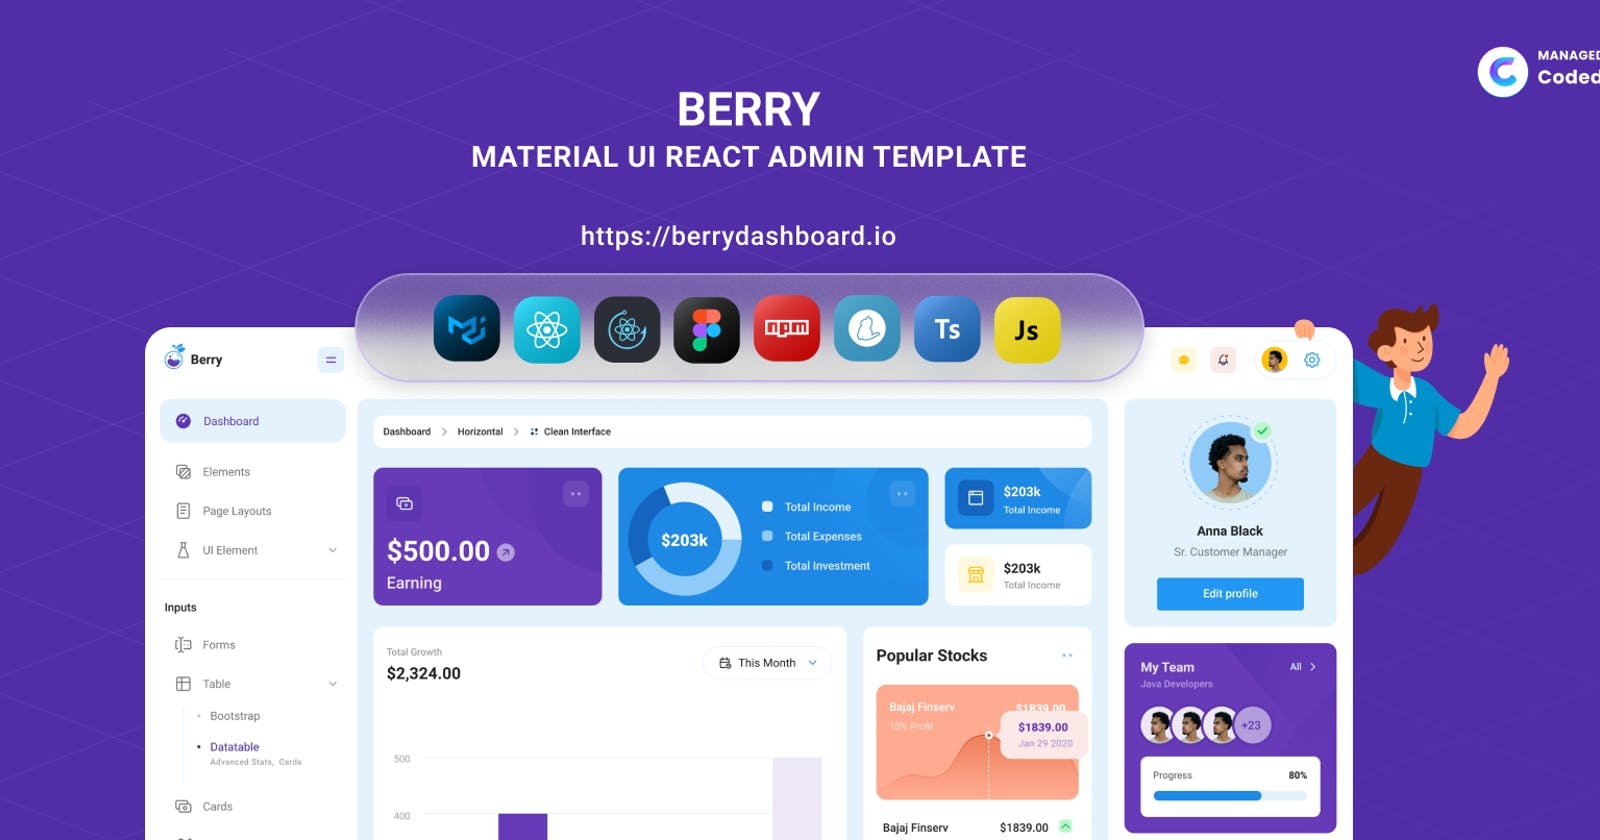 Introducing Berry React Admin Template